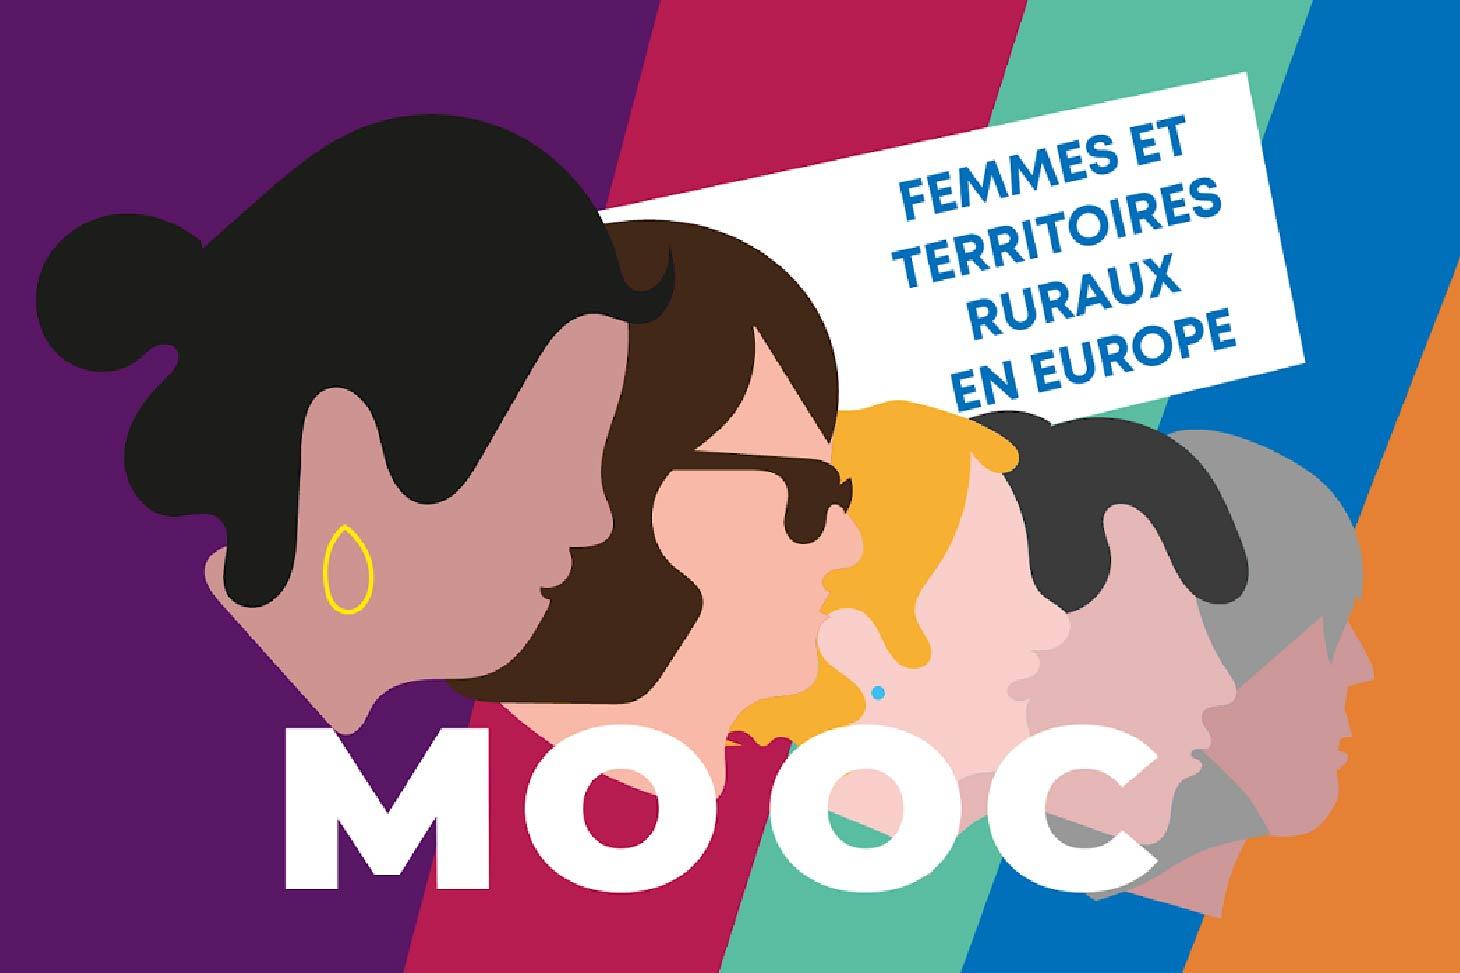 Lancement du MOOC femmes et territoires ruraux en Europe